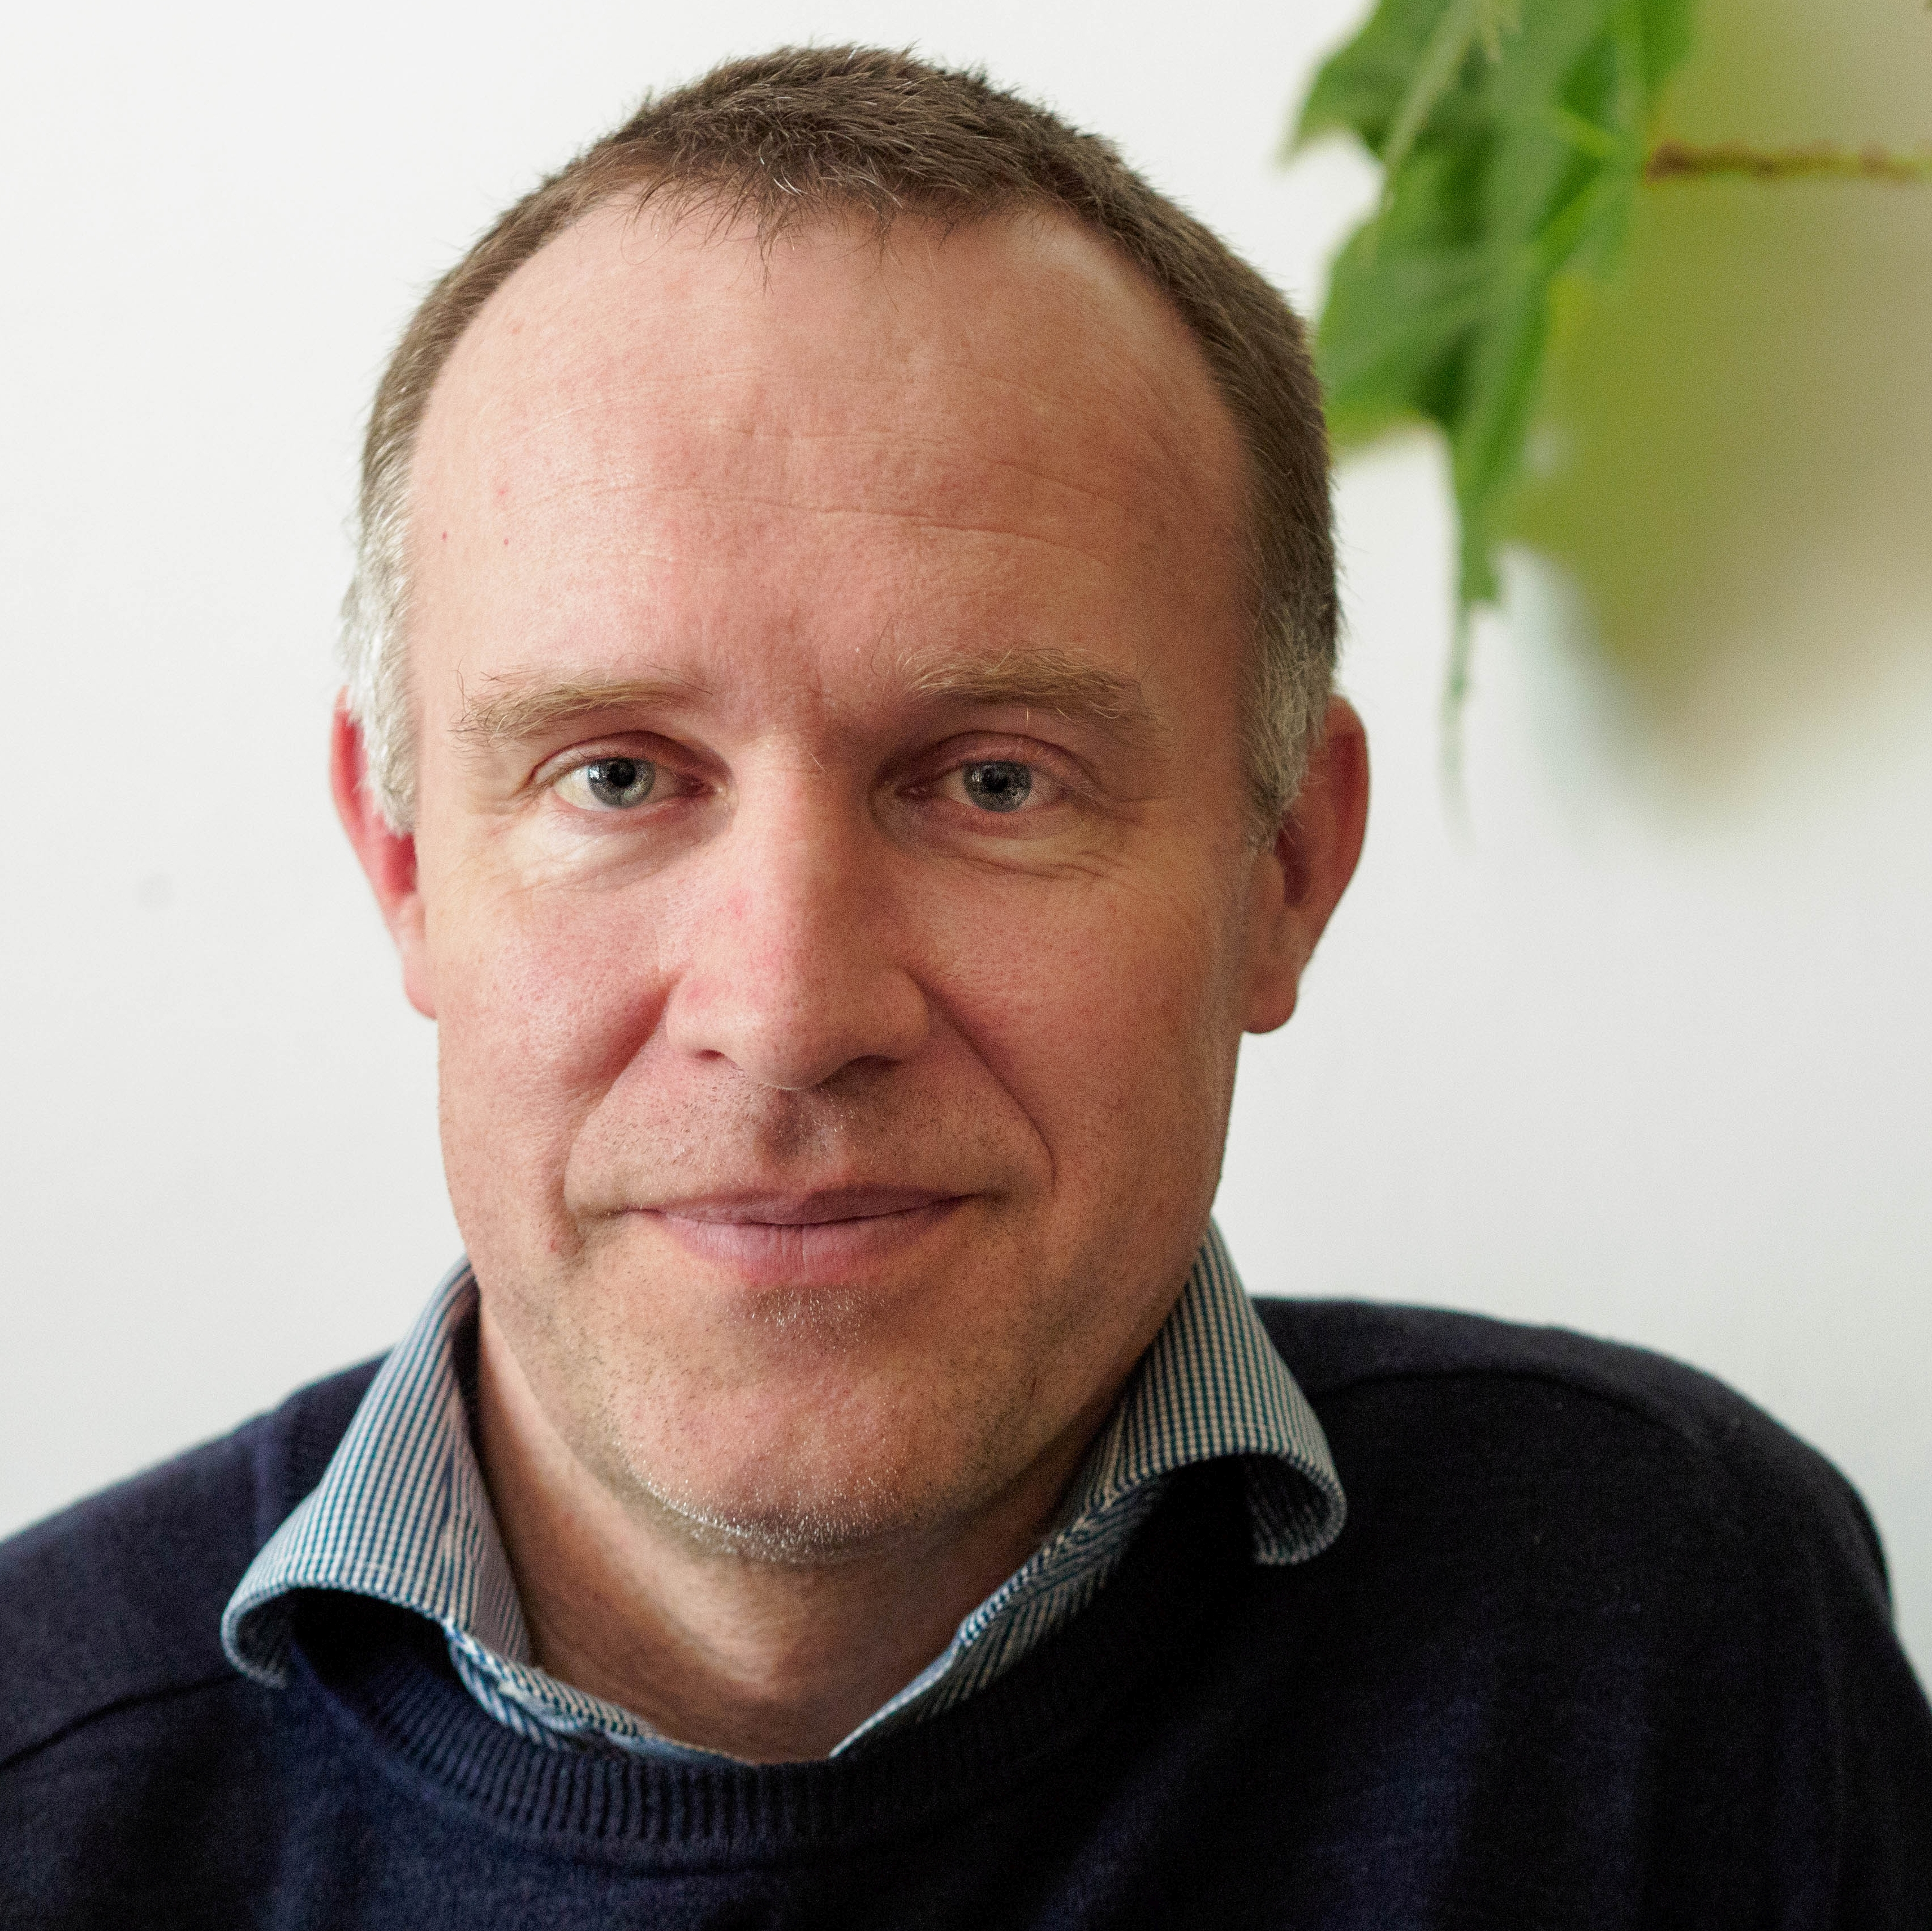 Peter Guštafík / Tréner, facilitátor